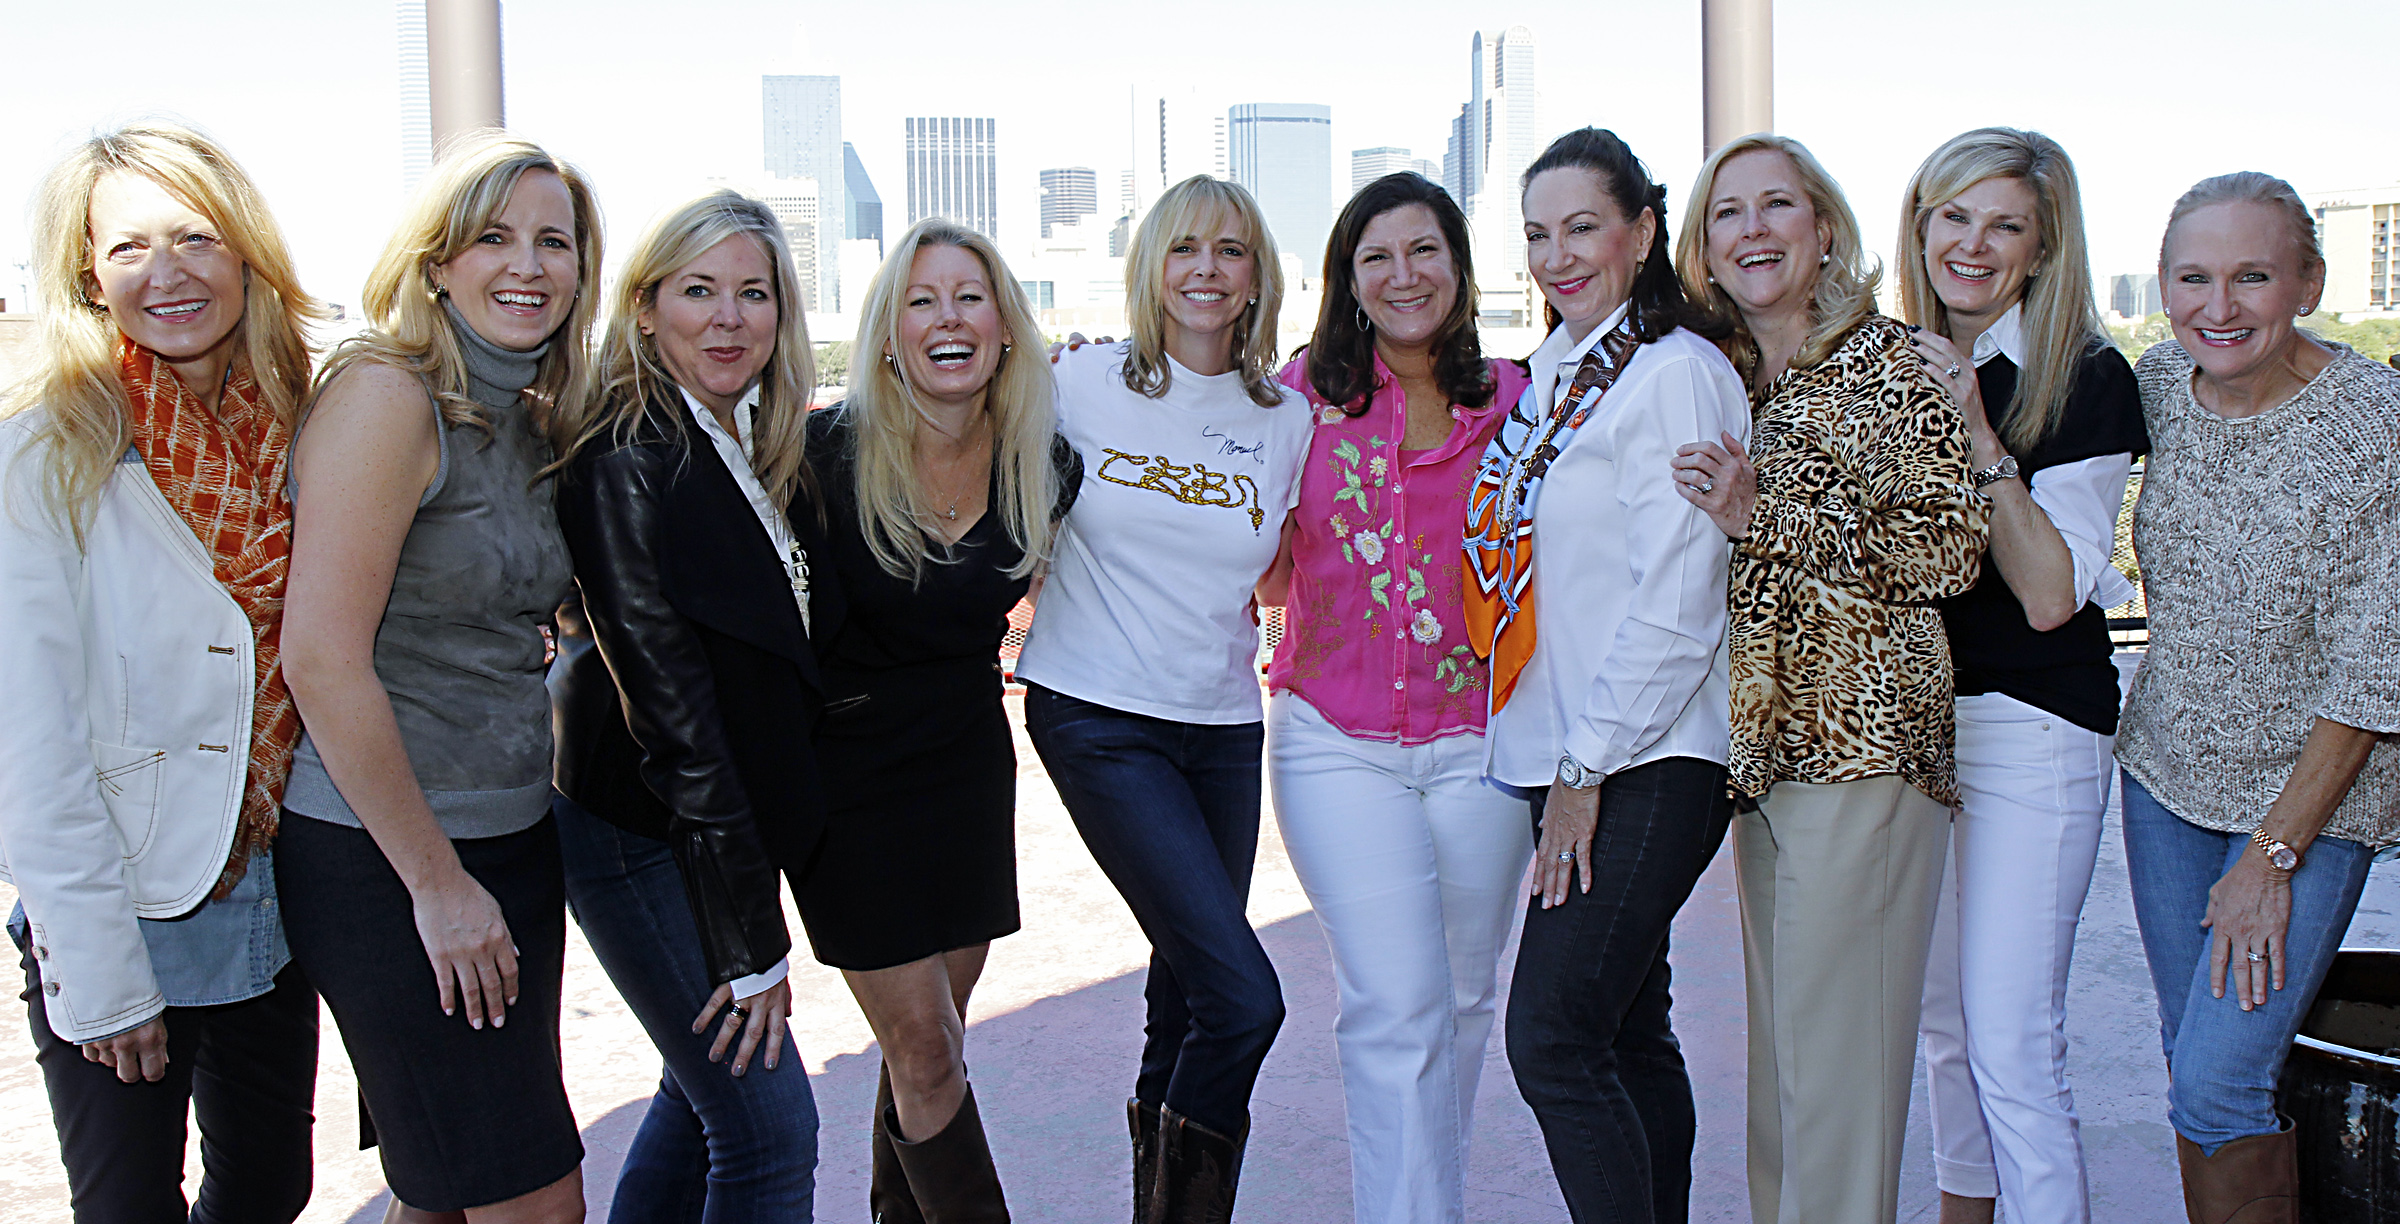 Lynn McBee, Kristen Sanger, Kristi Hoyl, Mary Gill, Cindy Stager, Jill Tananbaum, Cindy Turner, Gina Betts, Tanya Foster and Janie Condon